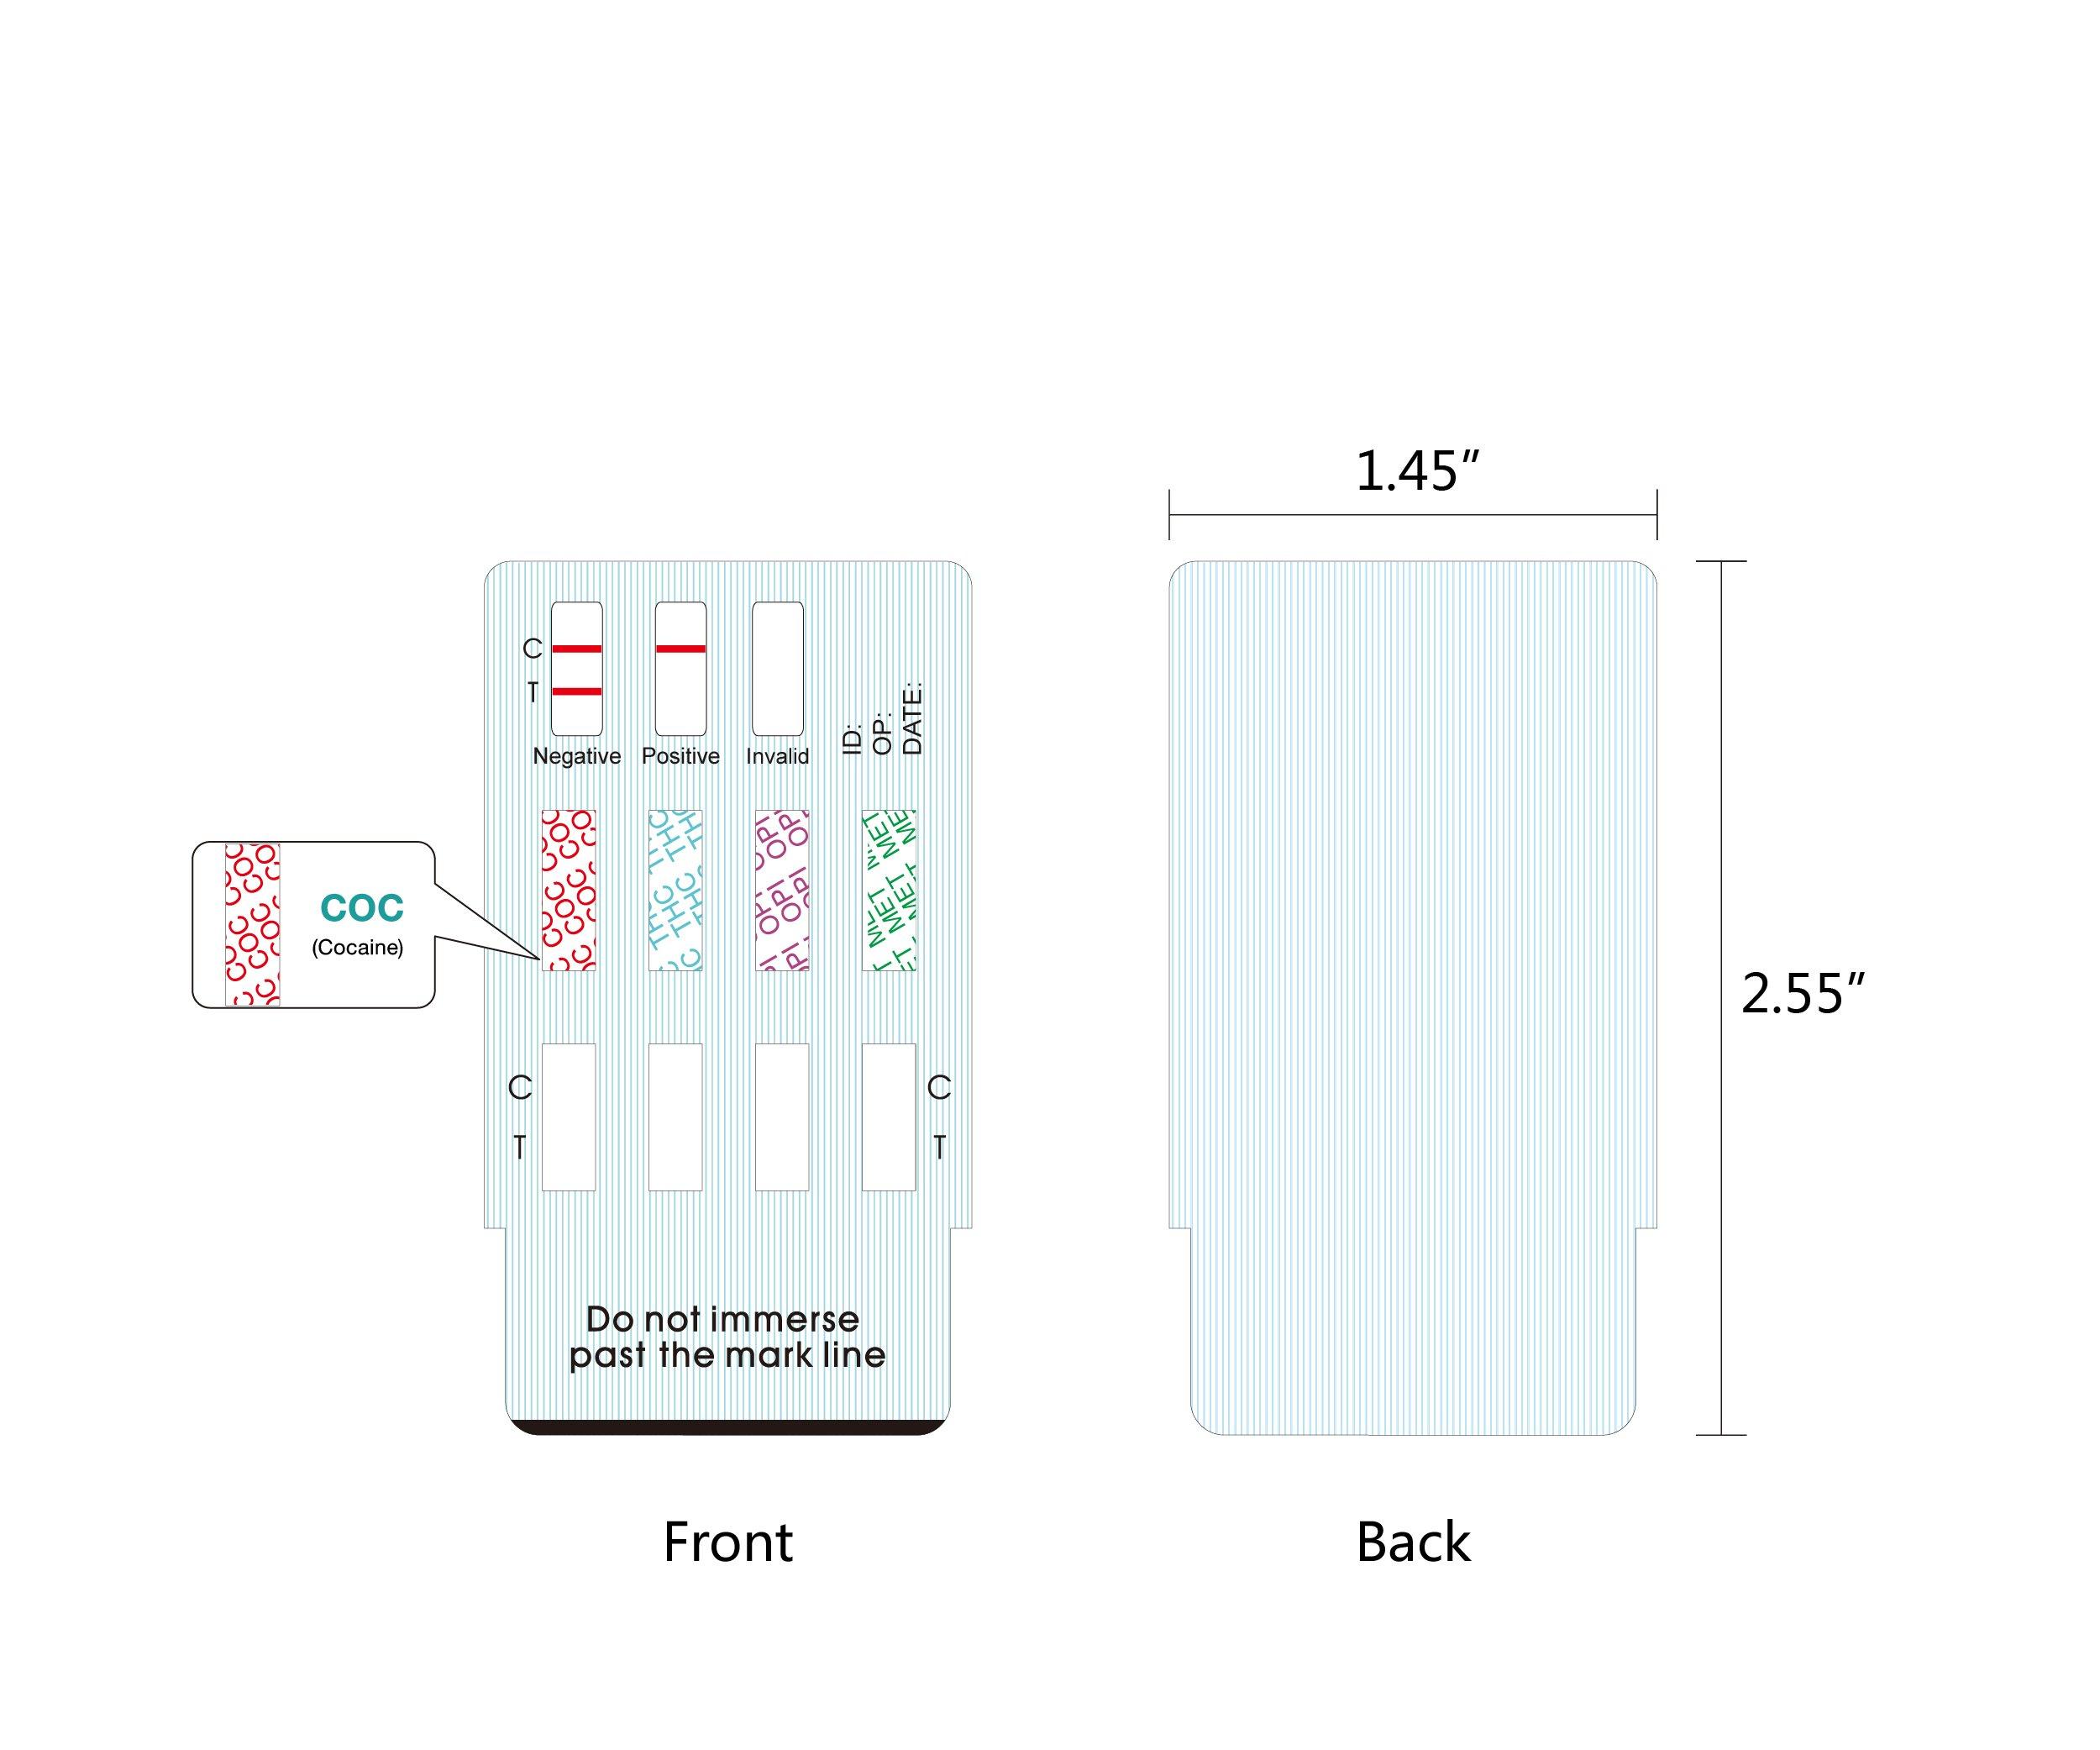 Easy@Home 10 Pack 4 Panel Instant Urine Drug Test - Cocaine (COC), Marijuana (THC), Opiates (OPI), MethAmphetamine (mAMP / MET) EDOAP#144